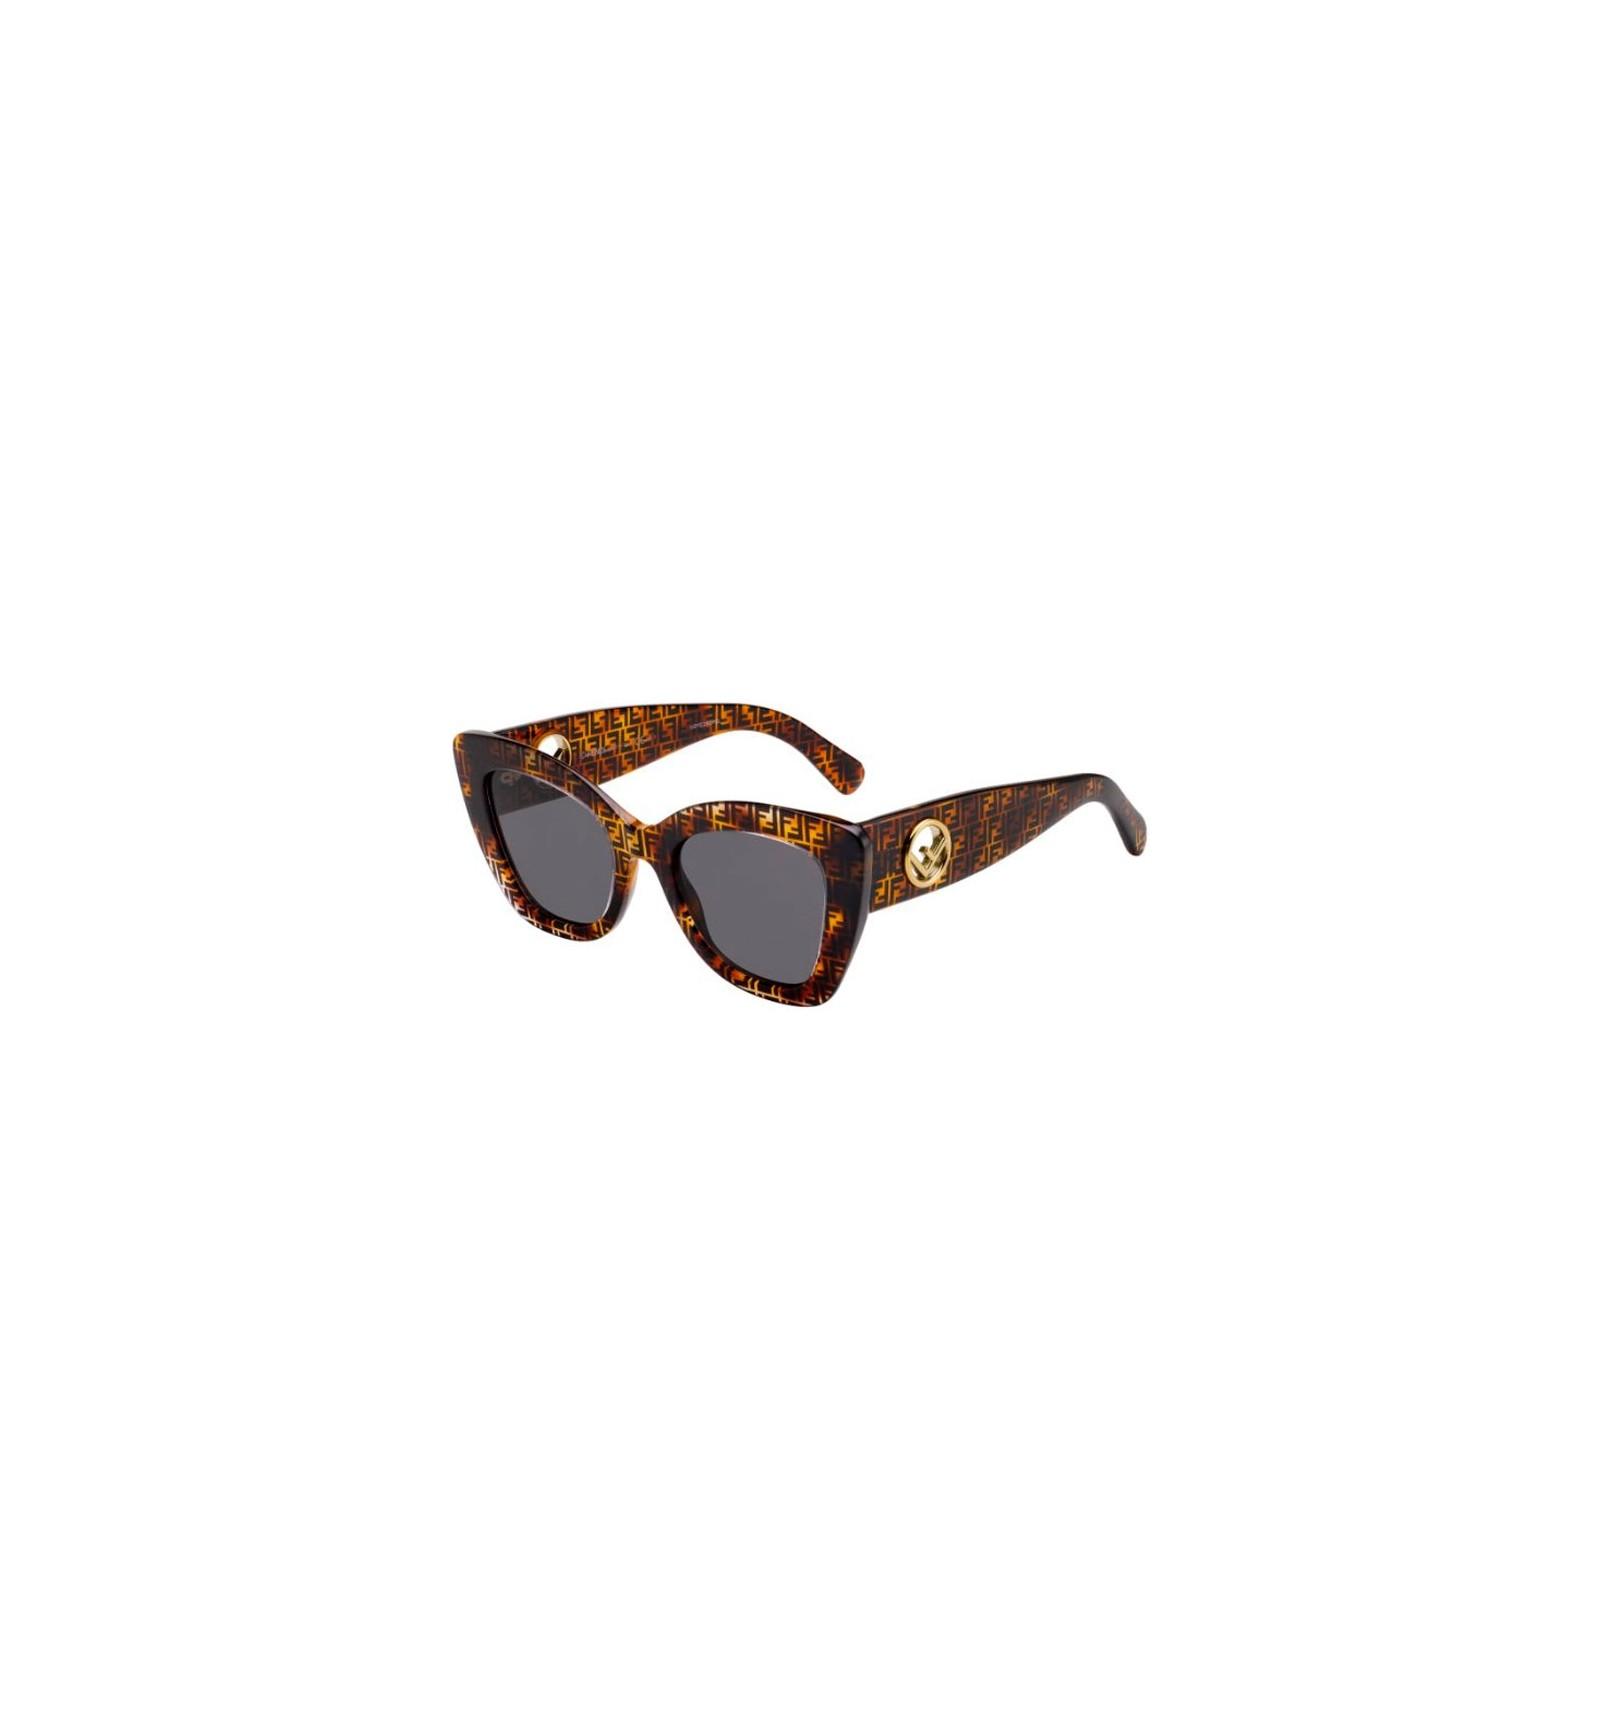 6f4d340979 Gafas de sol Fendi FF 0327S Dark Havana - Grey. Comprar Online